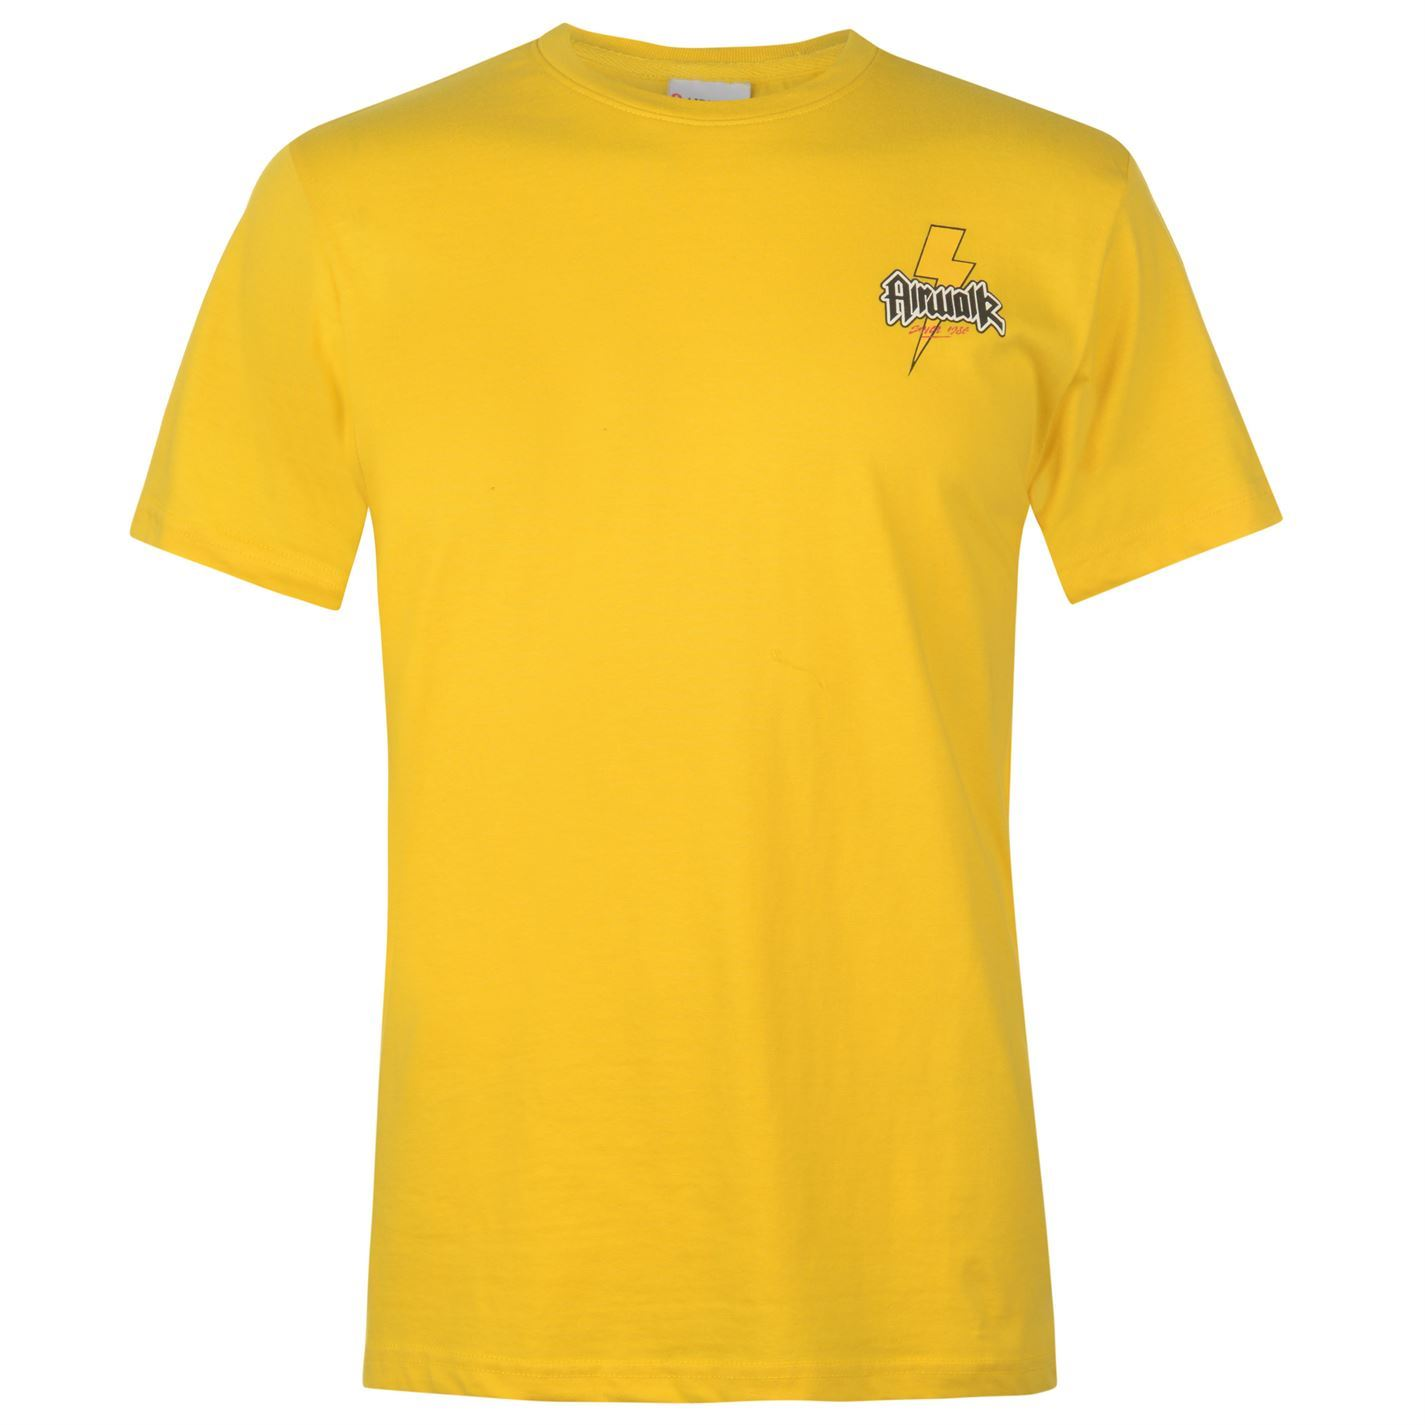 Airwalk Bolt Since 1986 Print T-Shirt Mens Skateboarding Top Tee White Small